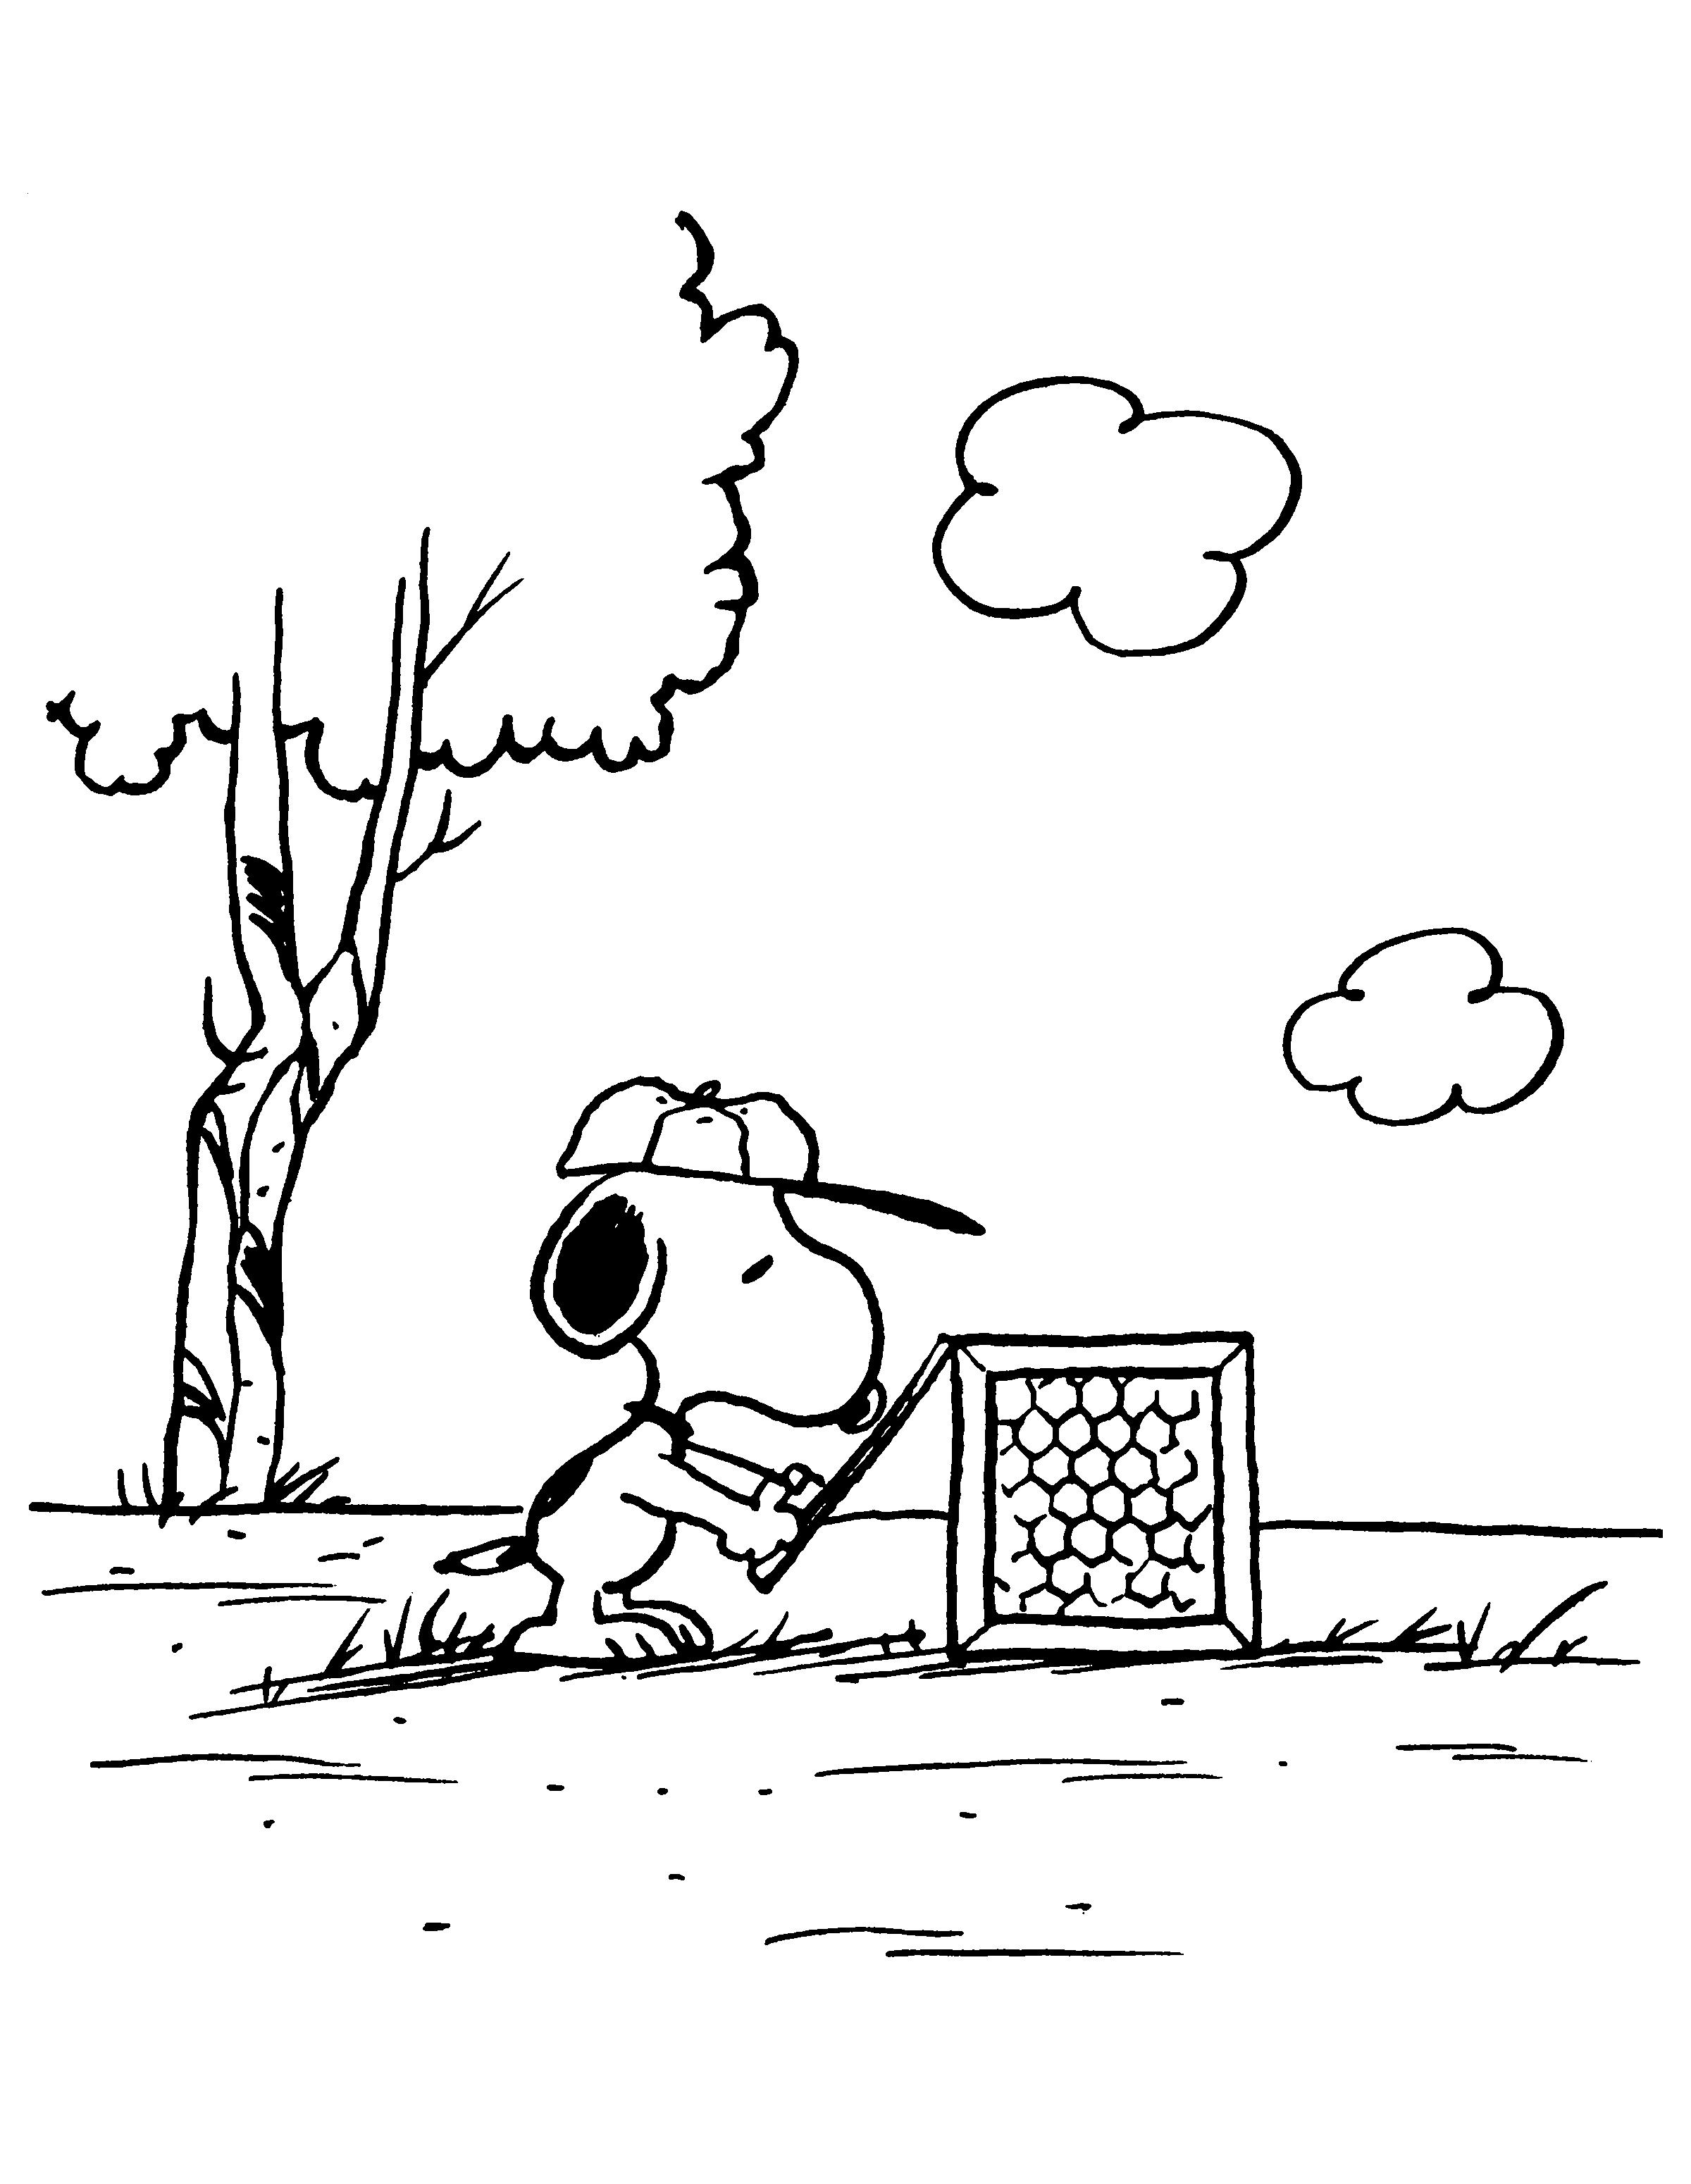 Kleurplaten Paradijs Kleurplaat Snoopy Snoopy